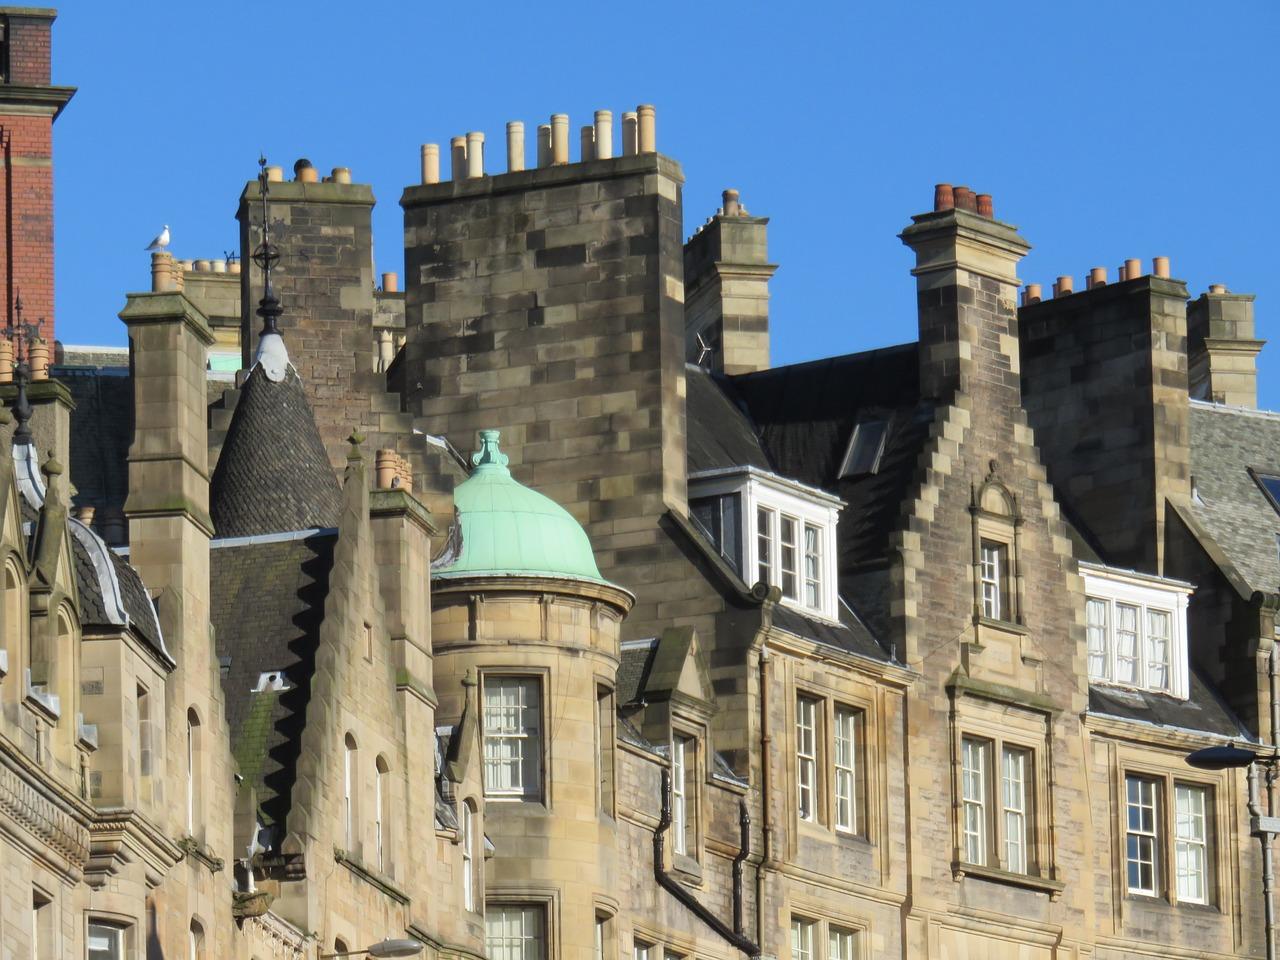 Cercare casa a Edimburgo con Rightmove